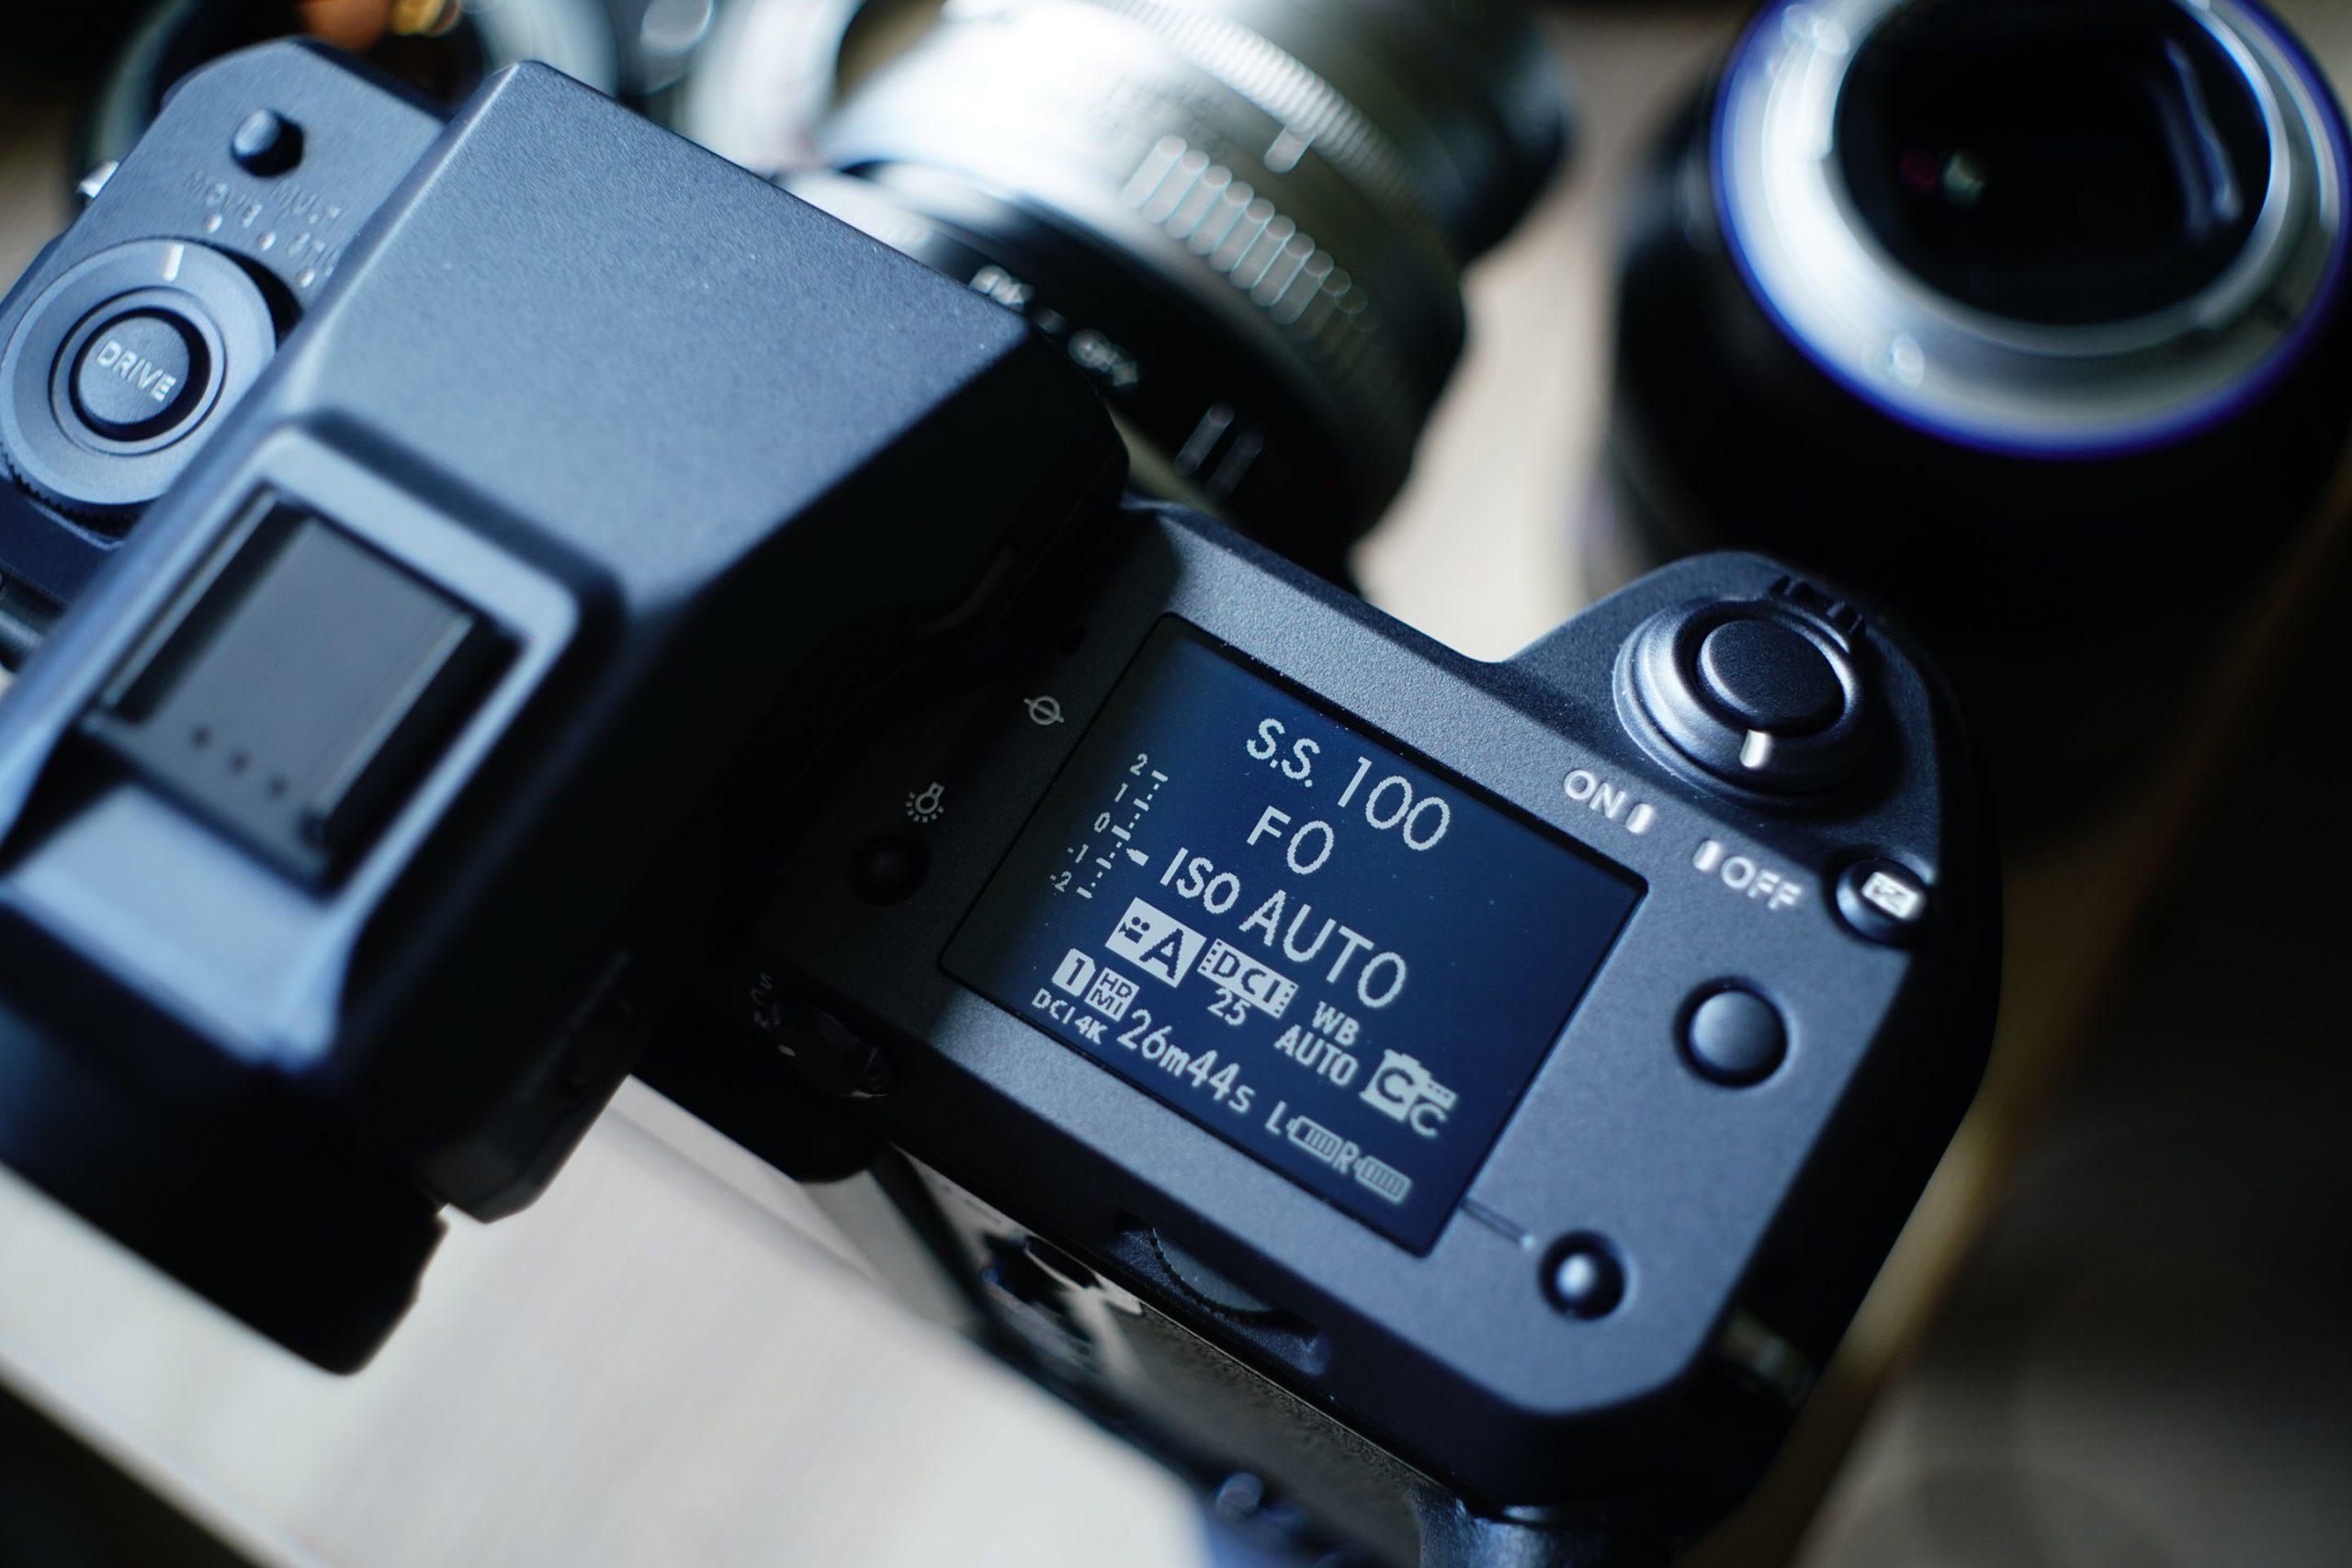 DSC00904-scaled.jpg